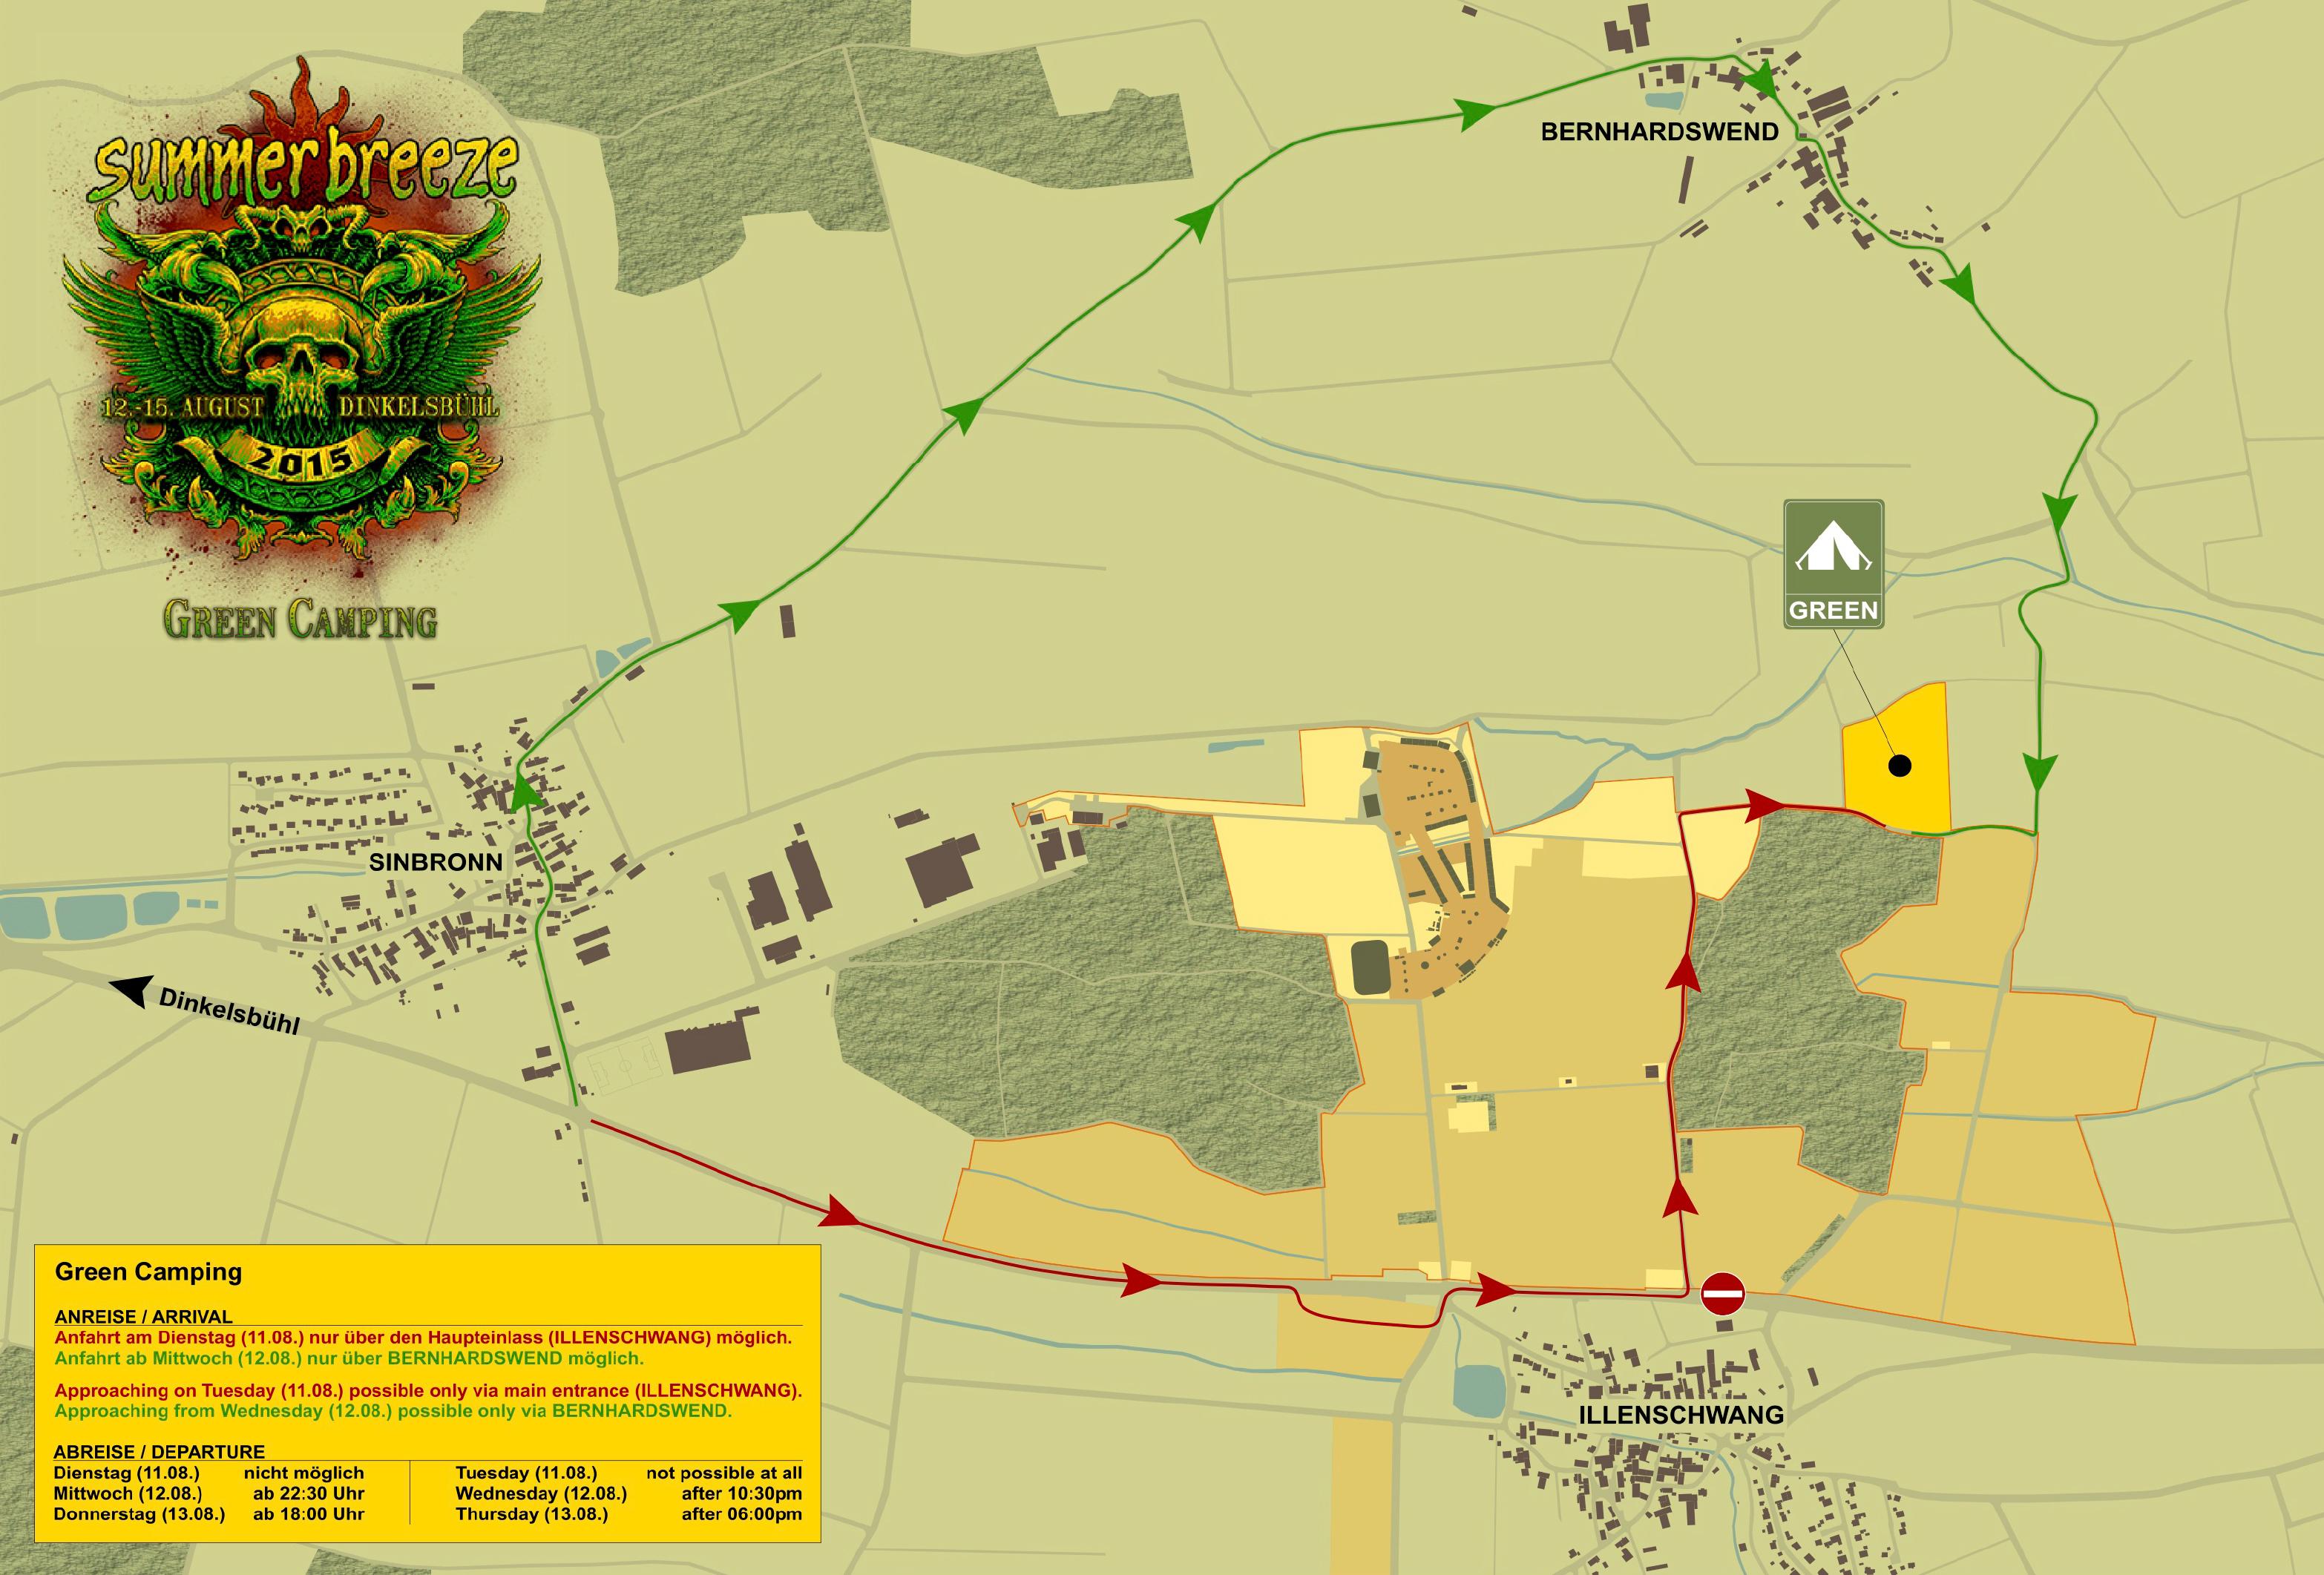 GREEN CAMPING location | Summer Breeze